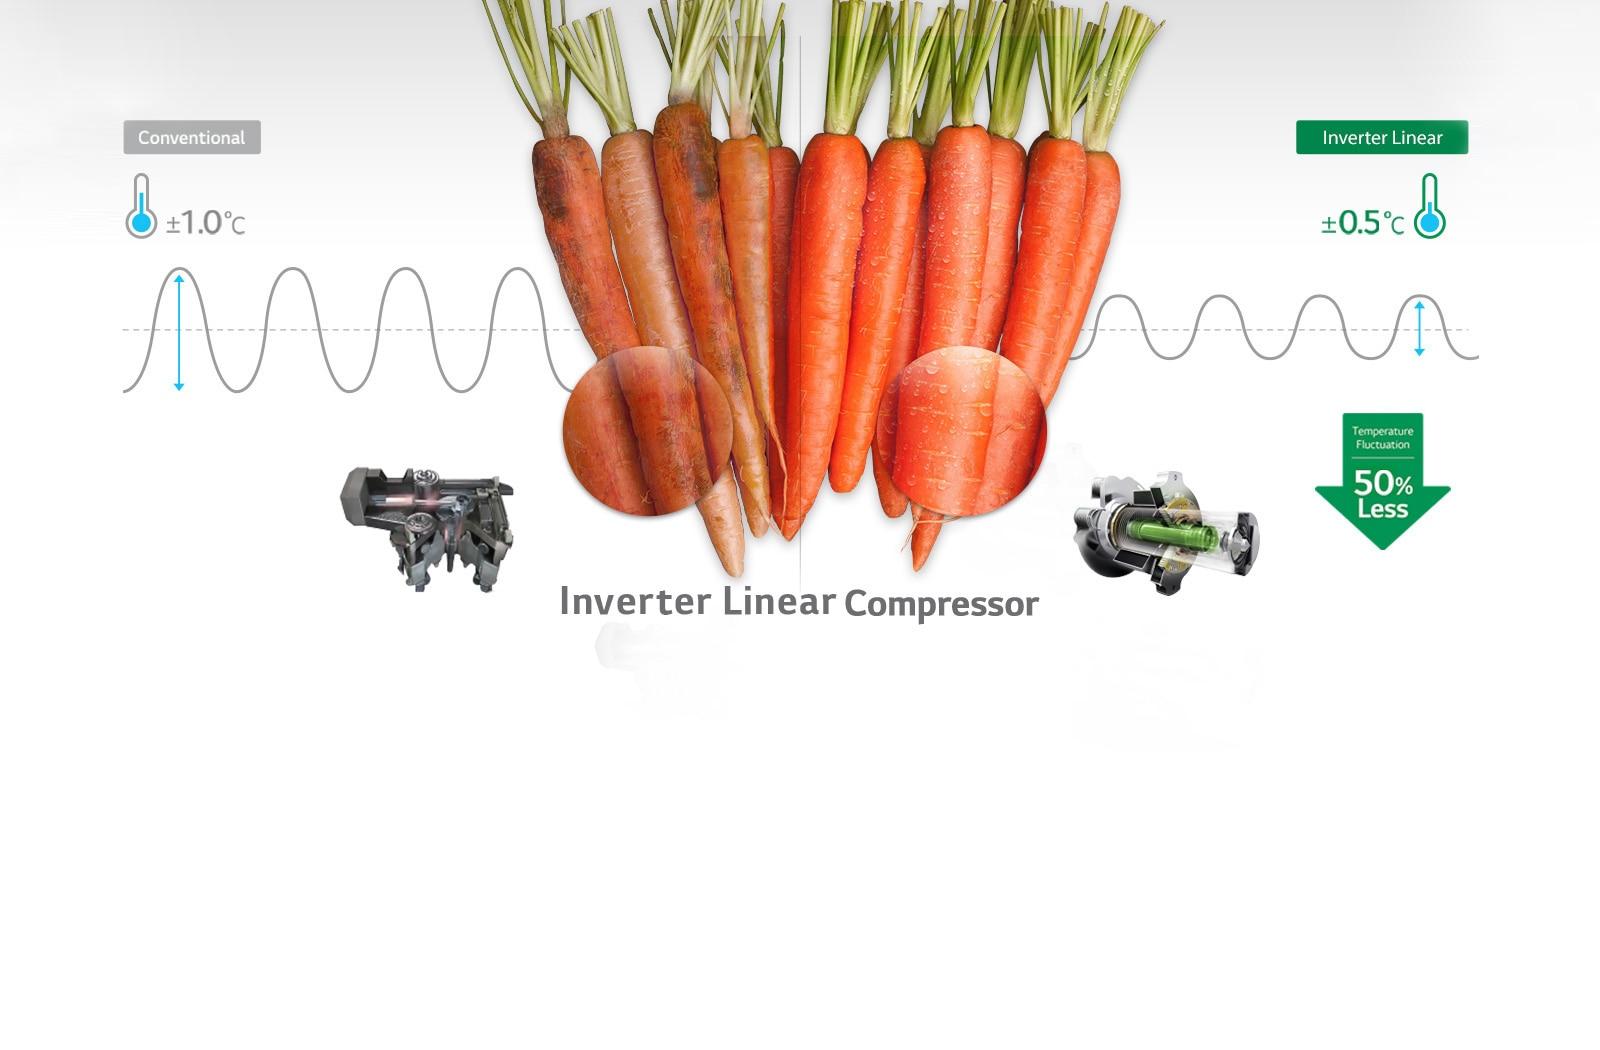 LG GL-T372JRS3 335 Ltr Inverter Linear Compressor